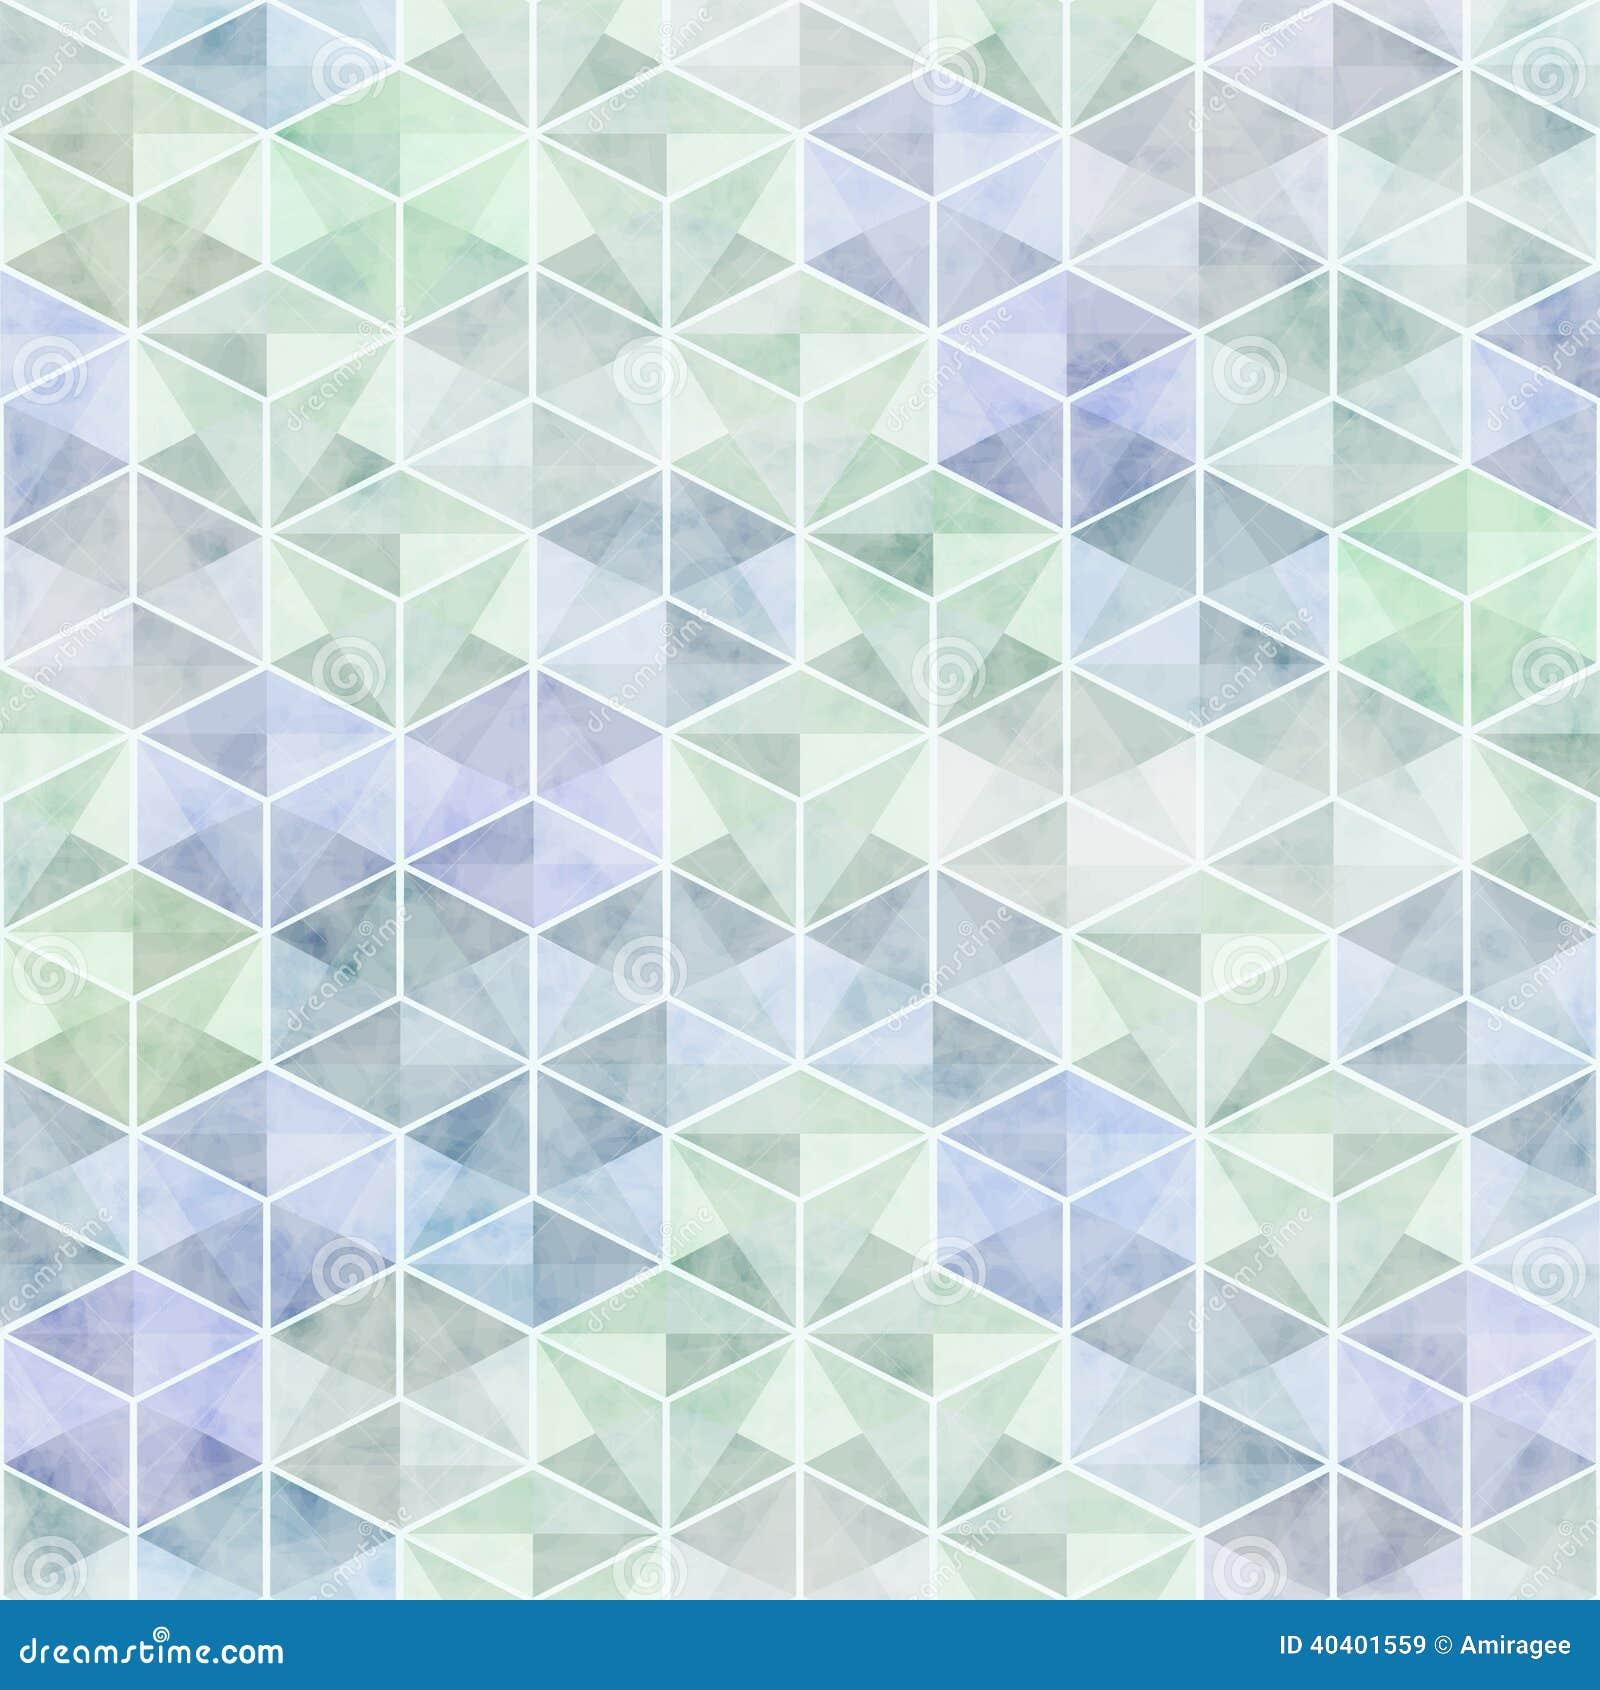 Vector abstract seamless texture